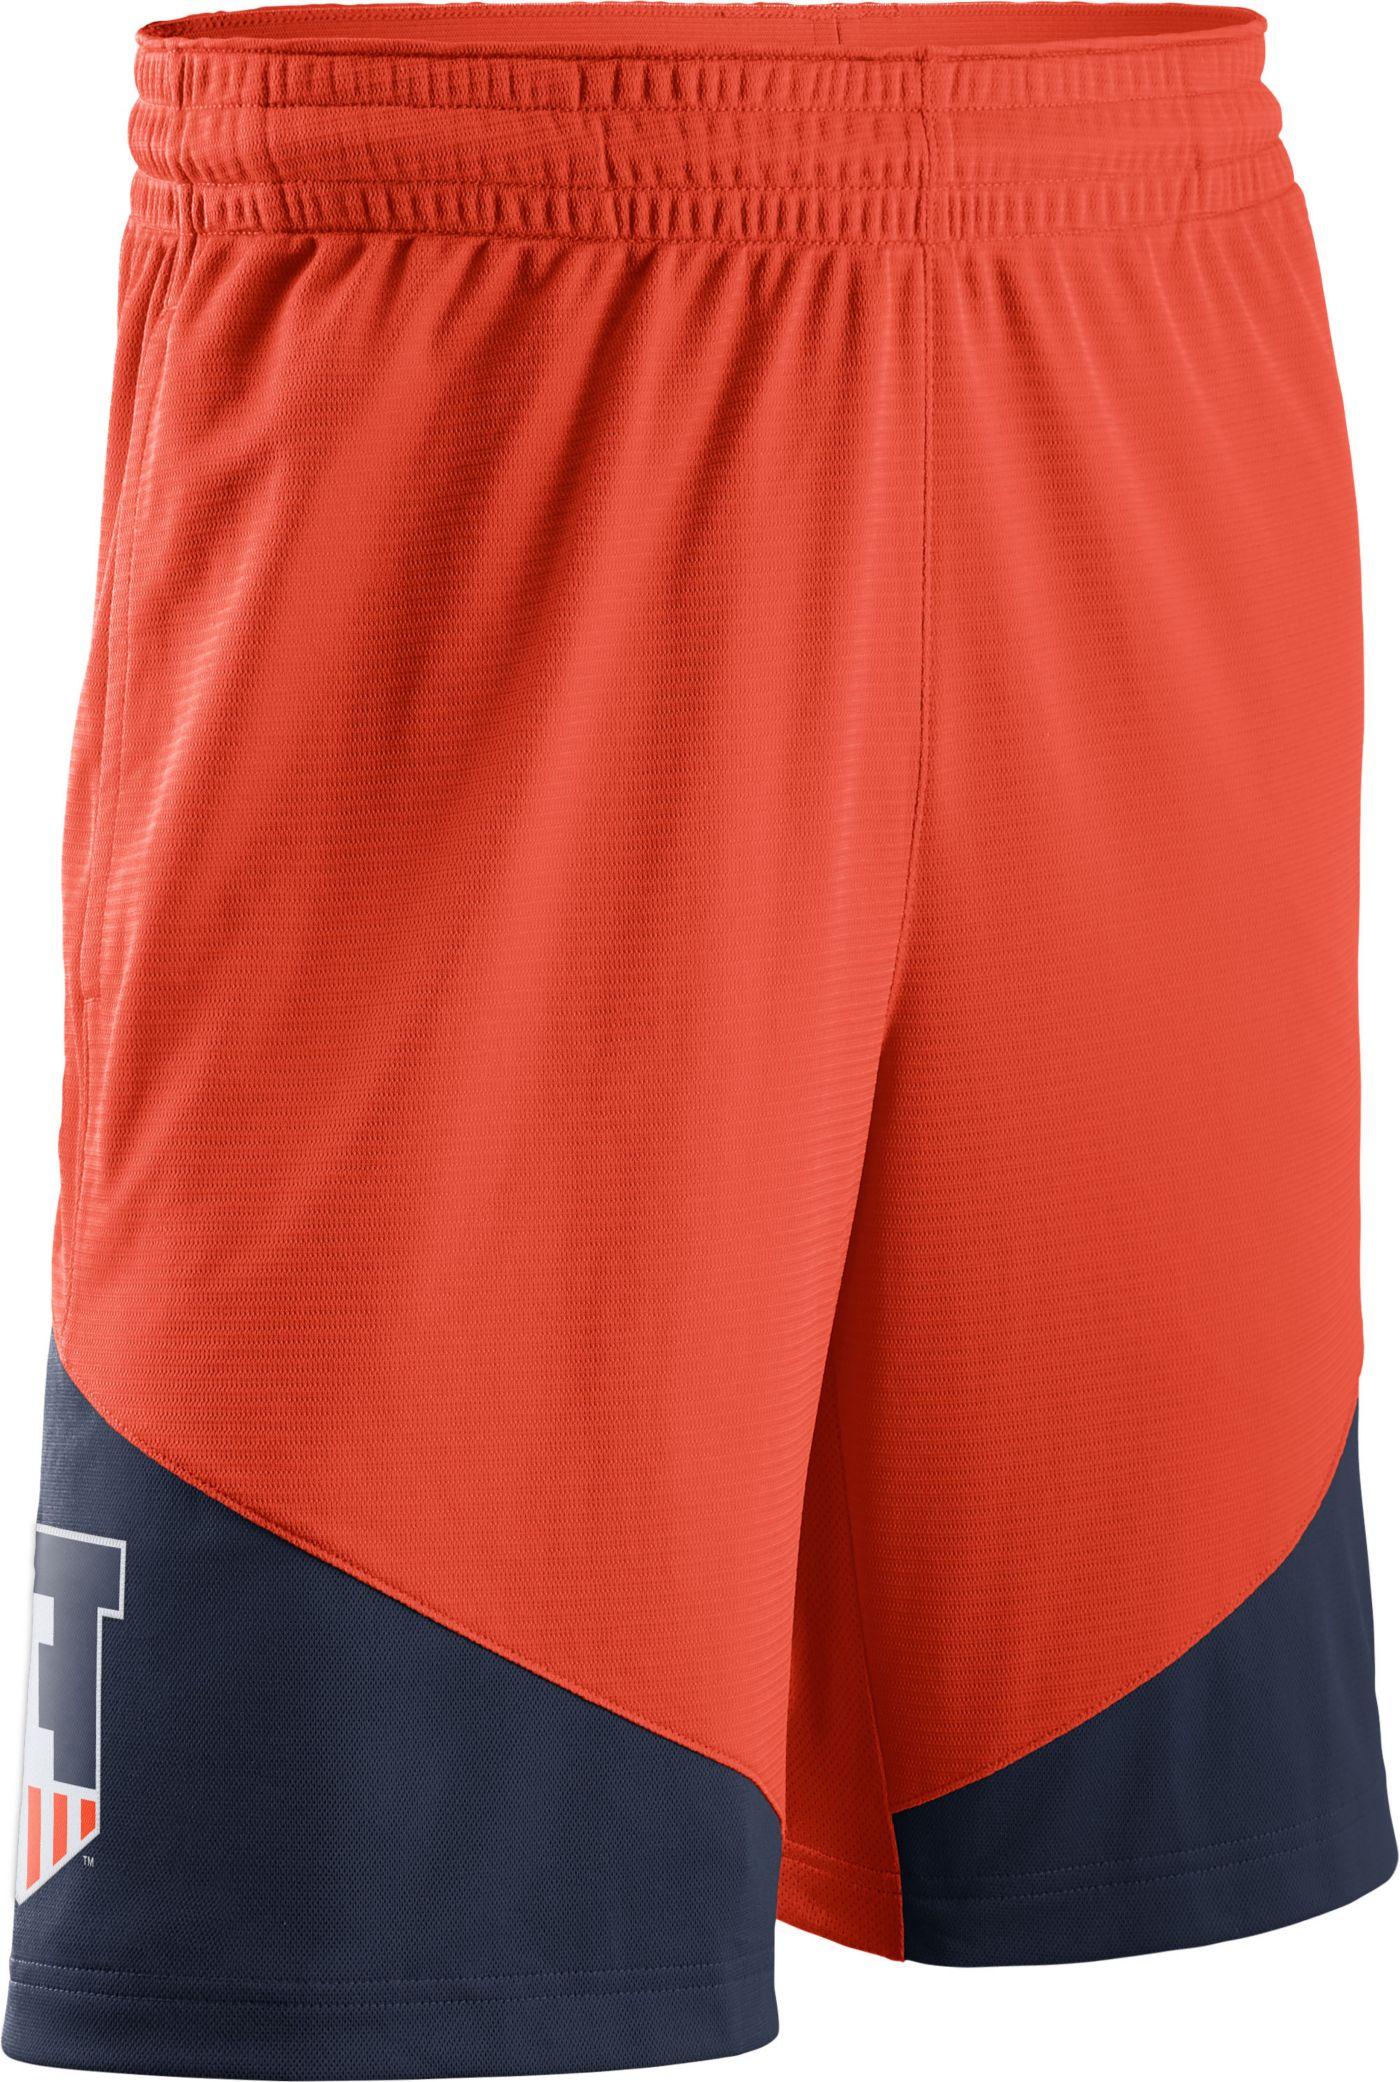 Nike Men's Illinois Fighting Illini Orange/Blue New Classics ELITE Basketball Shorts